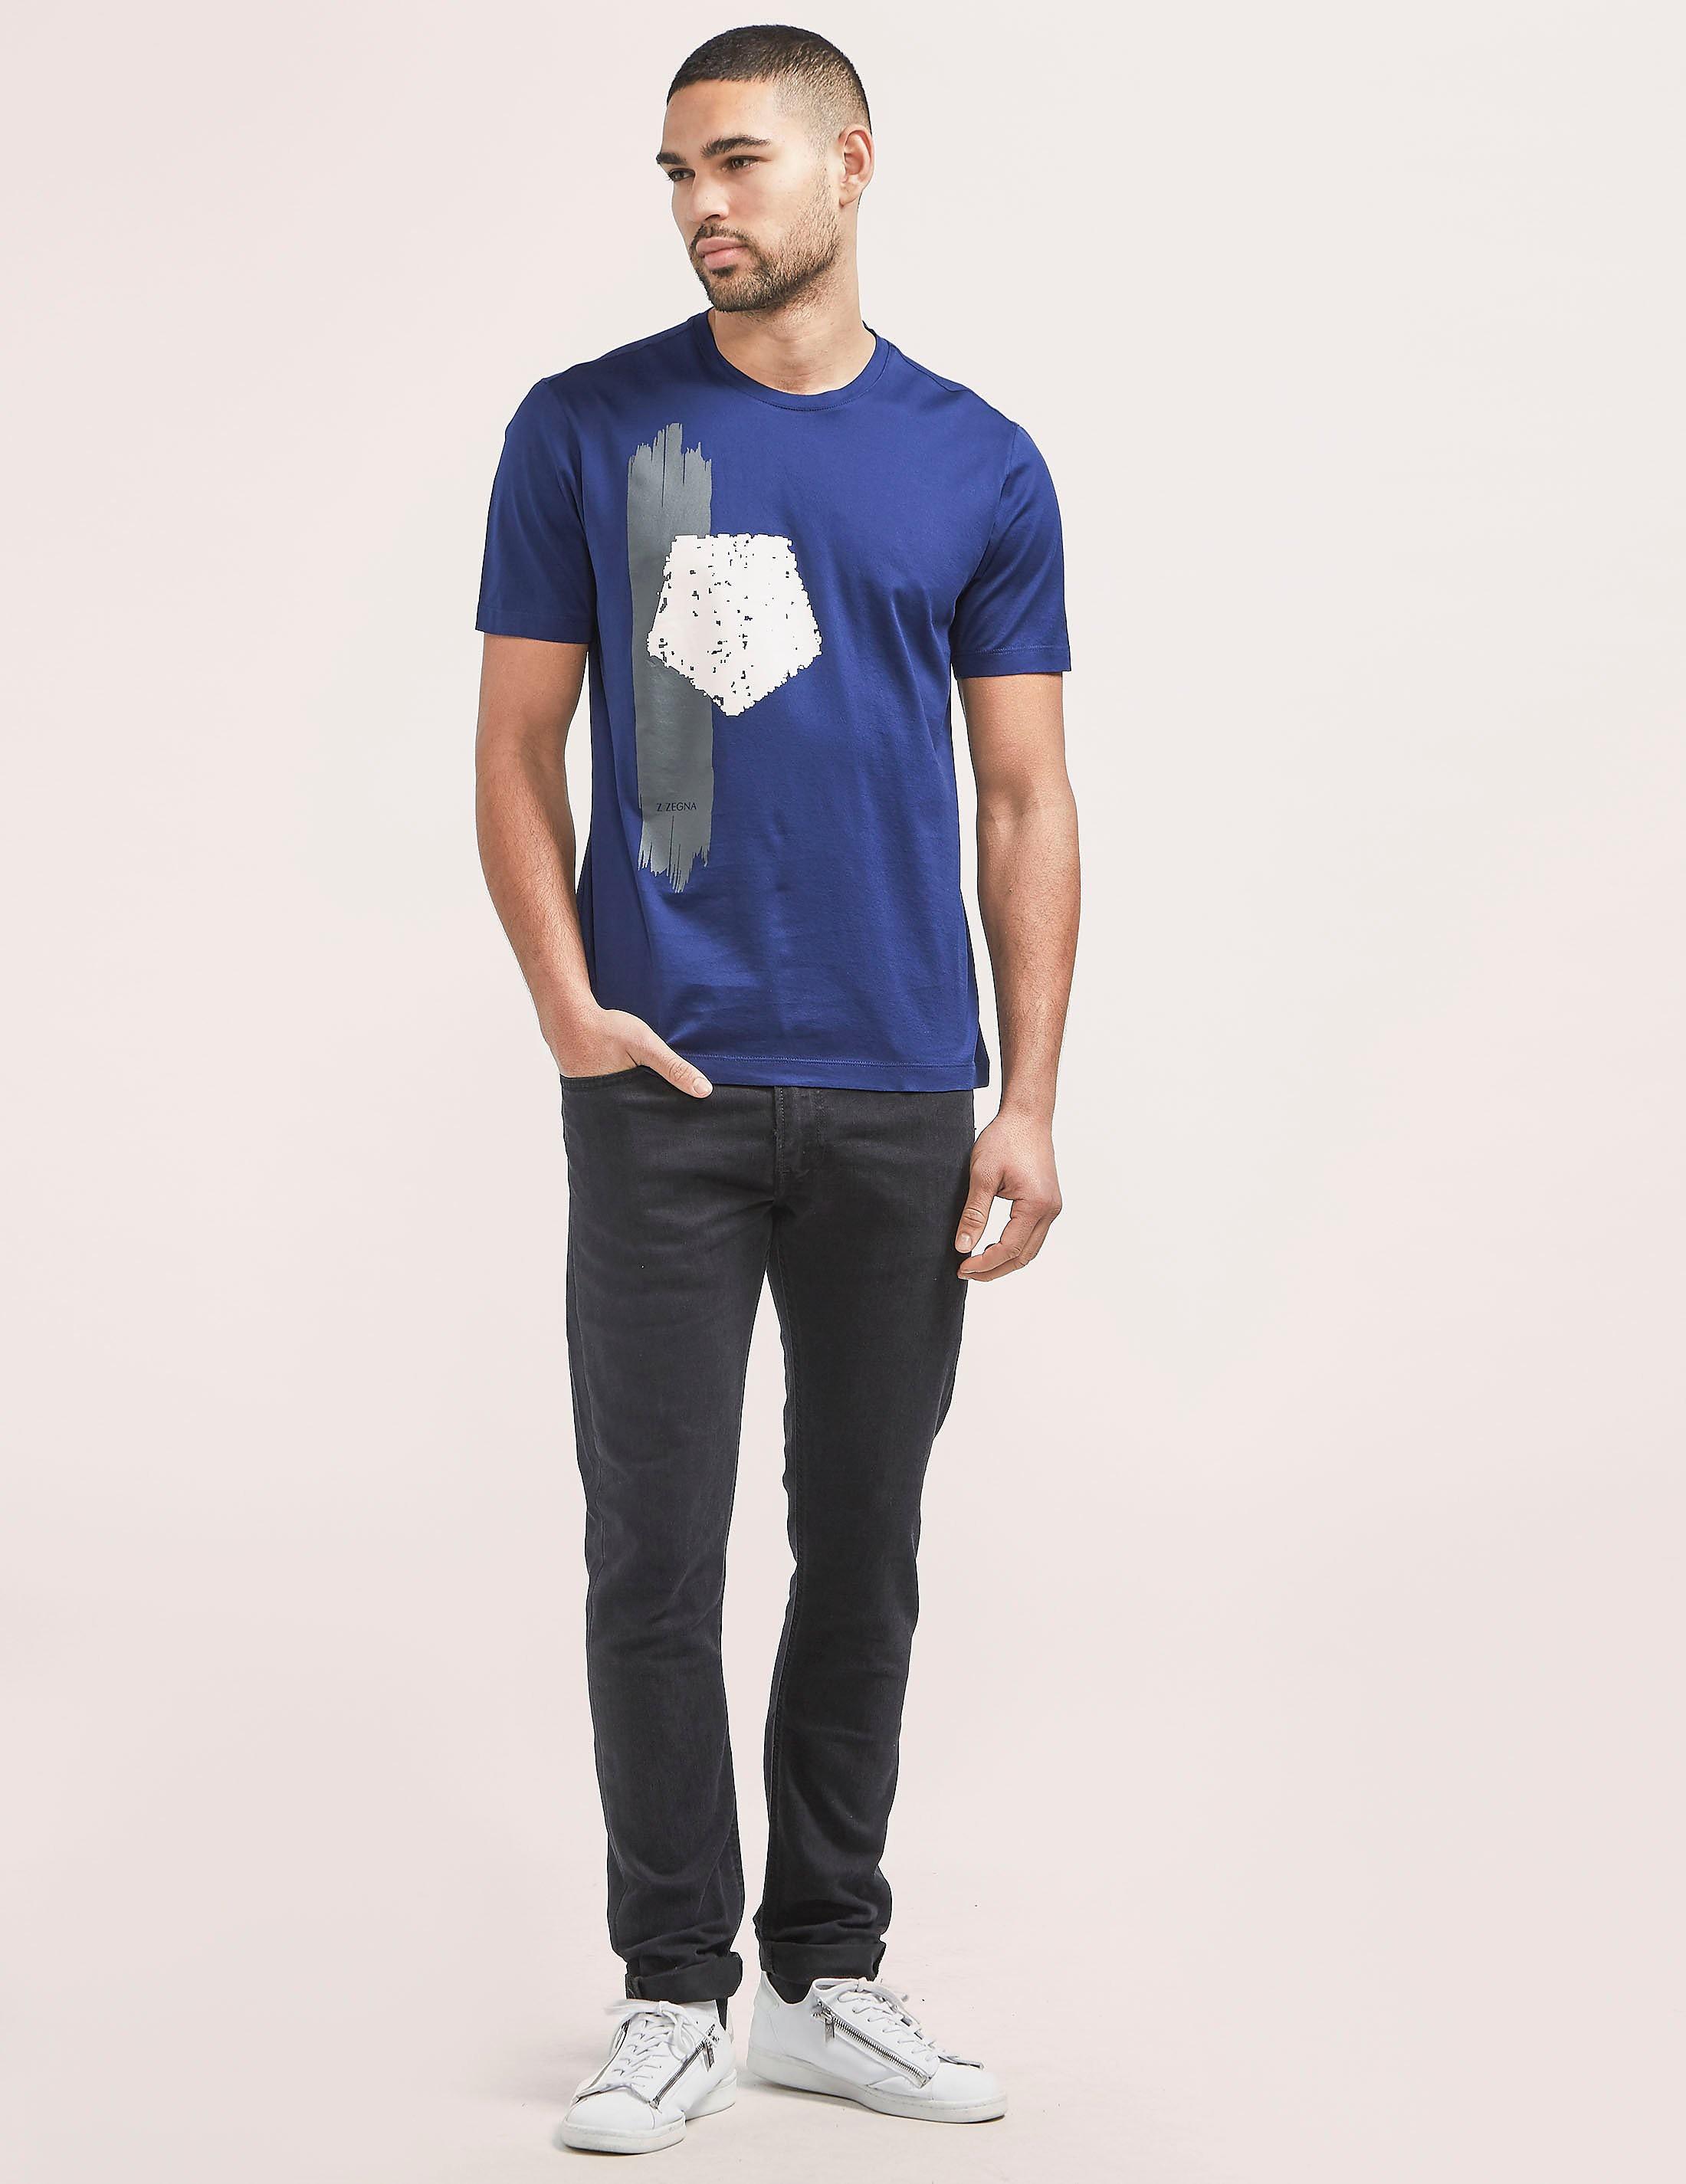 Z Zegna Paint Strip T-Shirt